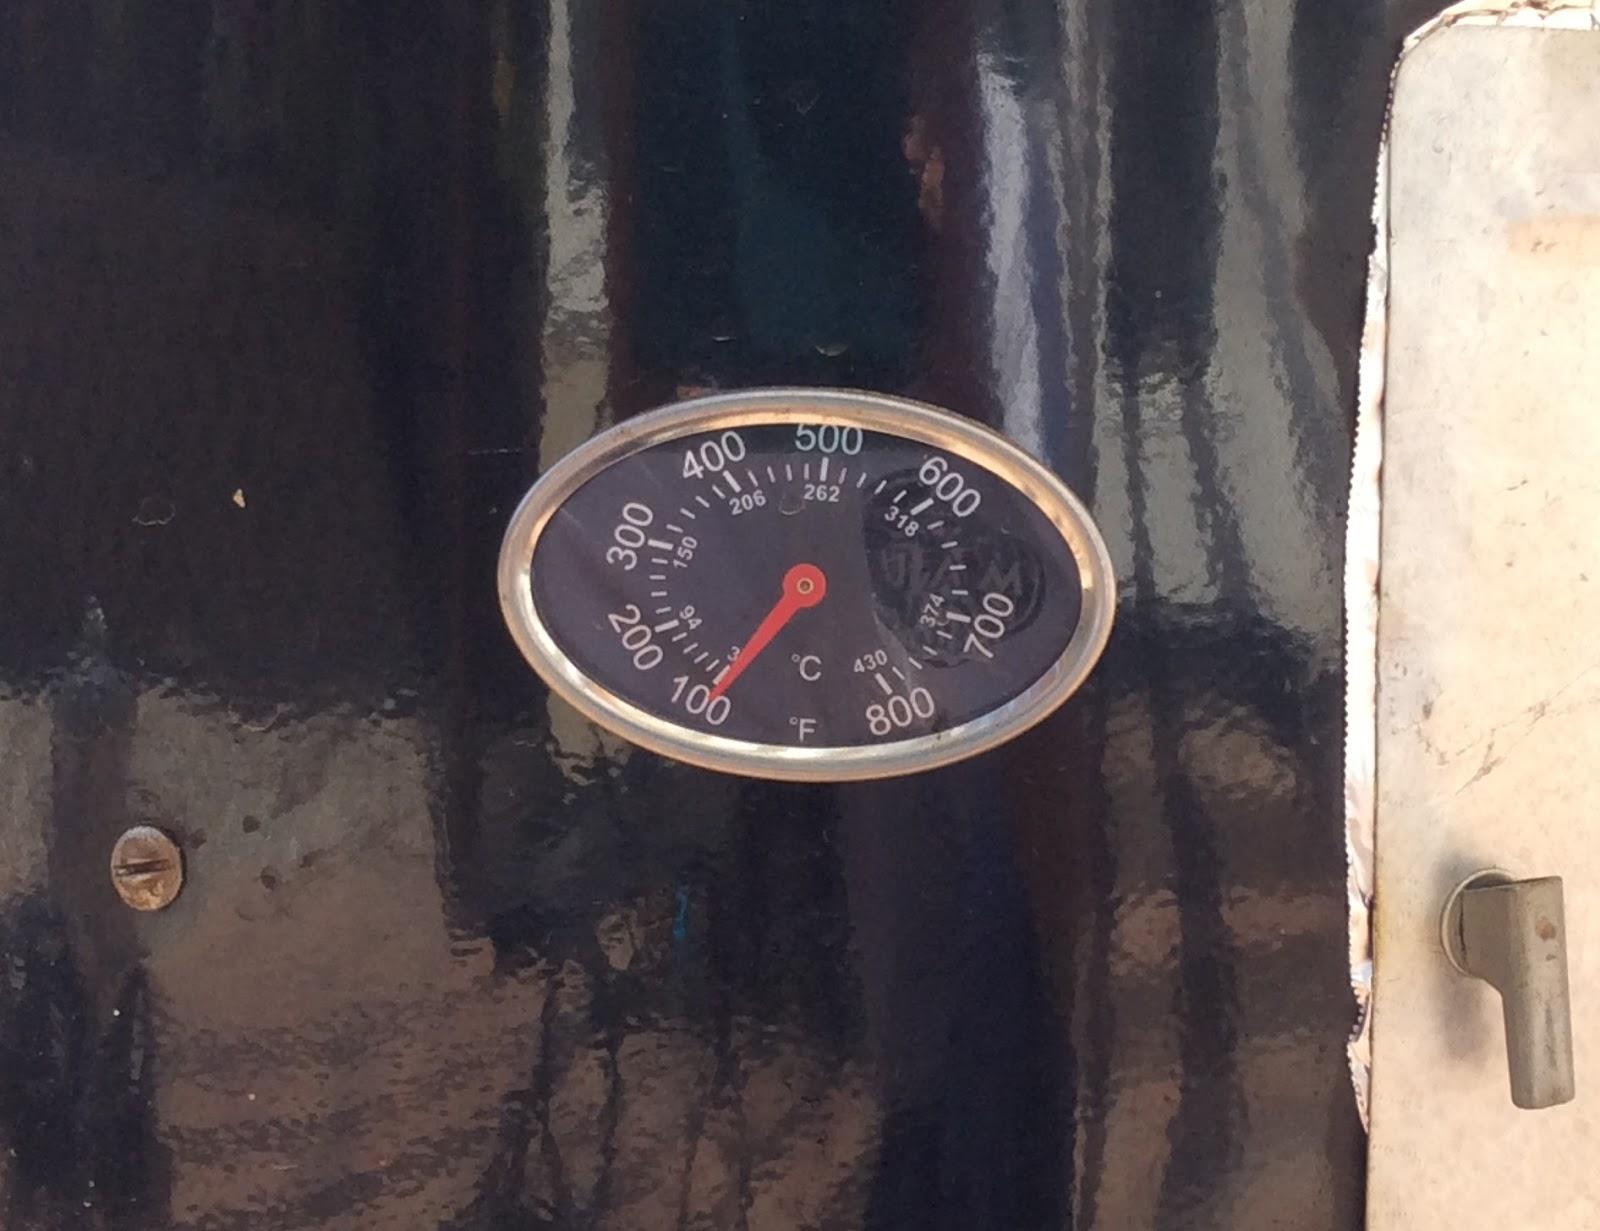 Optimal cold smoking temperature: 100° F or less